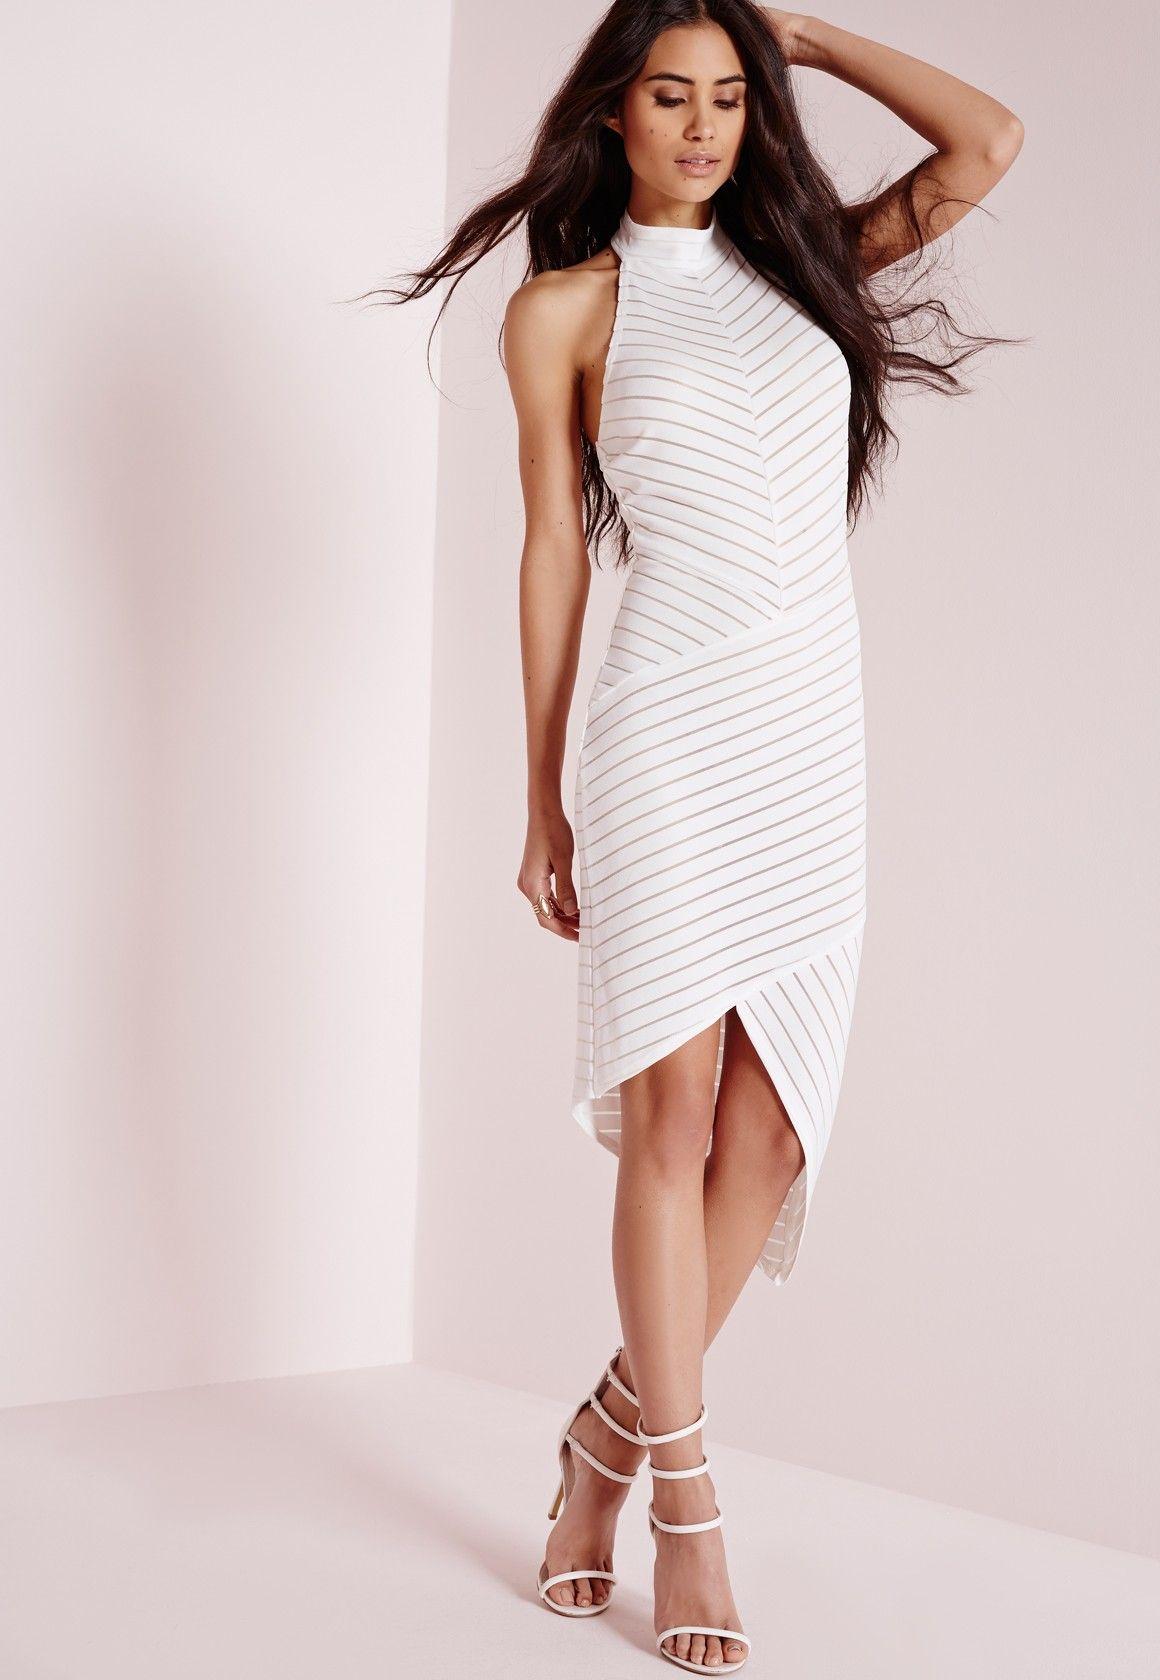 268c4066eb Missguided - Striped Mesh Sleeveless Bodycon Dress White